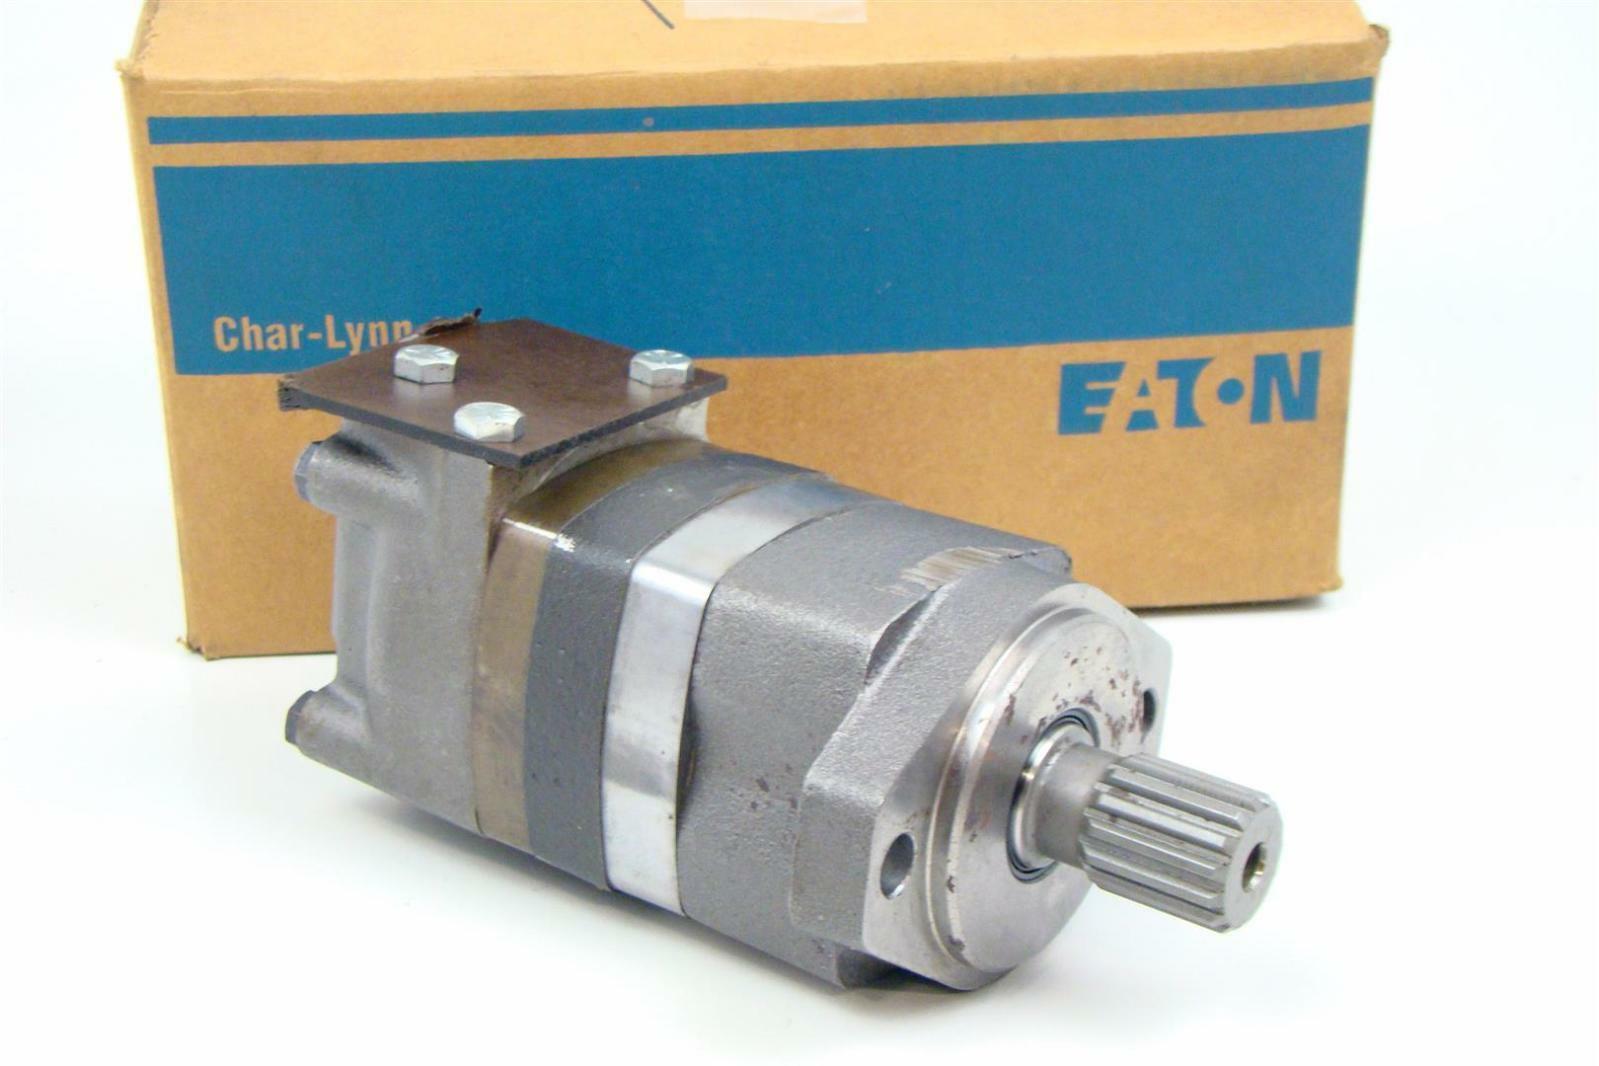 Eaton hydraulic motor 2000 series 4325 01 513 6598 104 Eaton motor